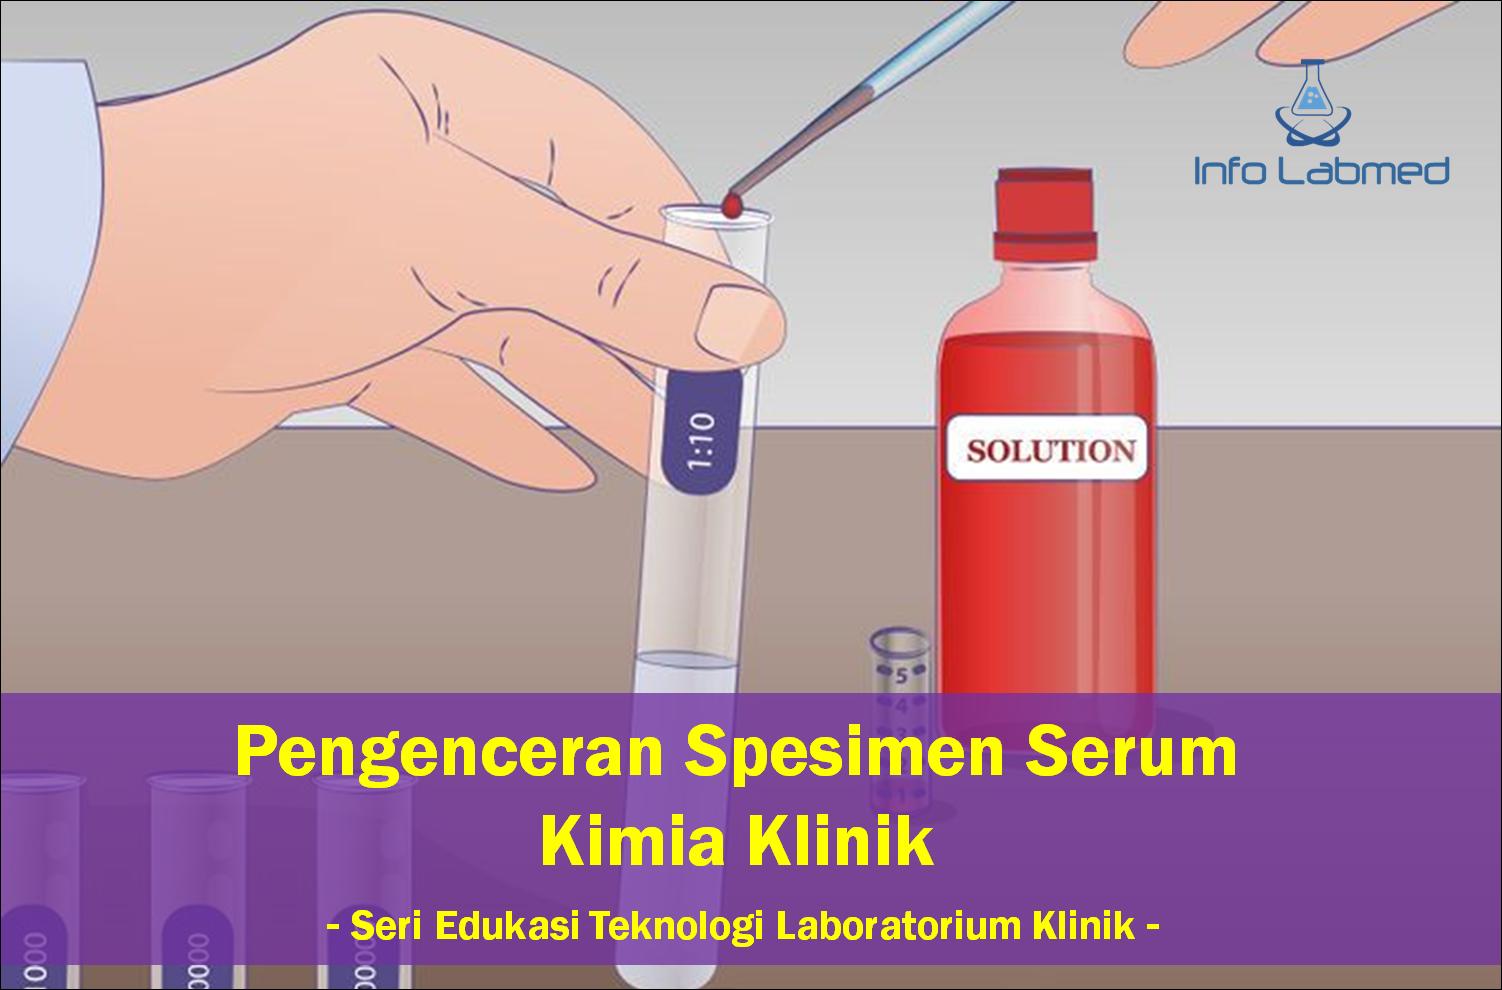 Pengenceran Spesimen Serum Kimia Klinik Seri Edukasi Teknologi Aquabides Setiap Analis Kesehatan Yang Akan Bekerja Dan Tidak Semuanya Menguasai Ilmu Ini Hal Kurangnya Pengetahuan Tentang Linearitas Alat